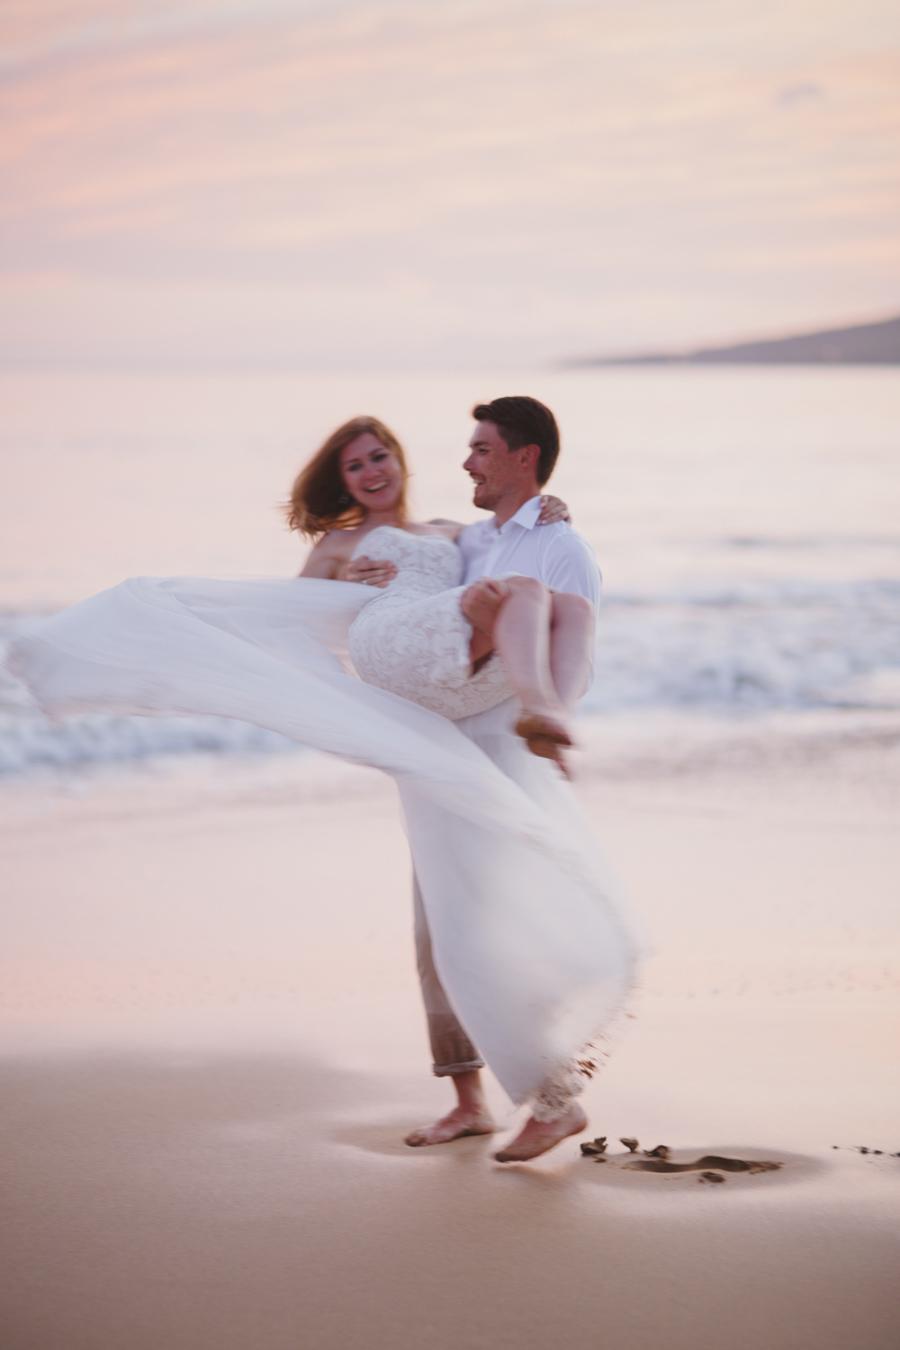 Romantic Beach Wedding Photography